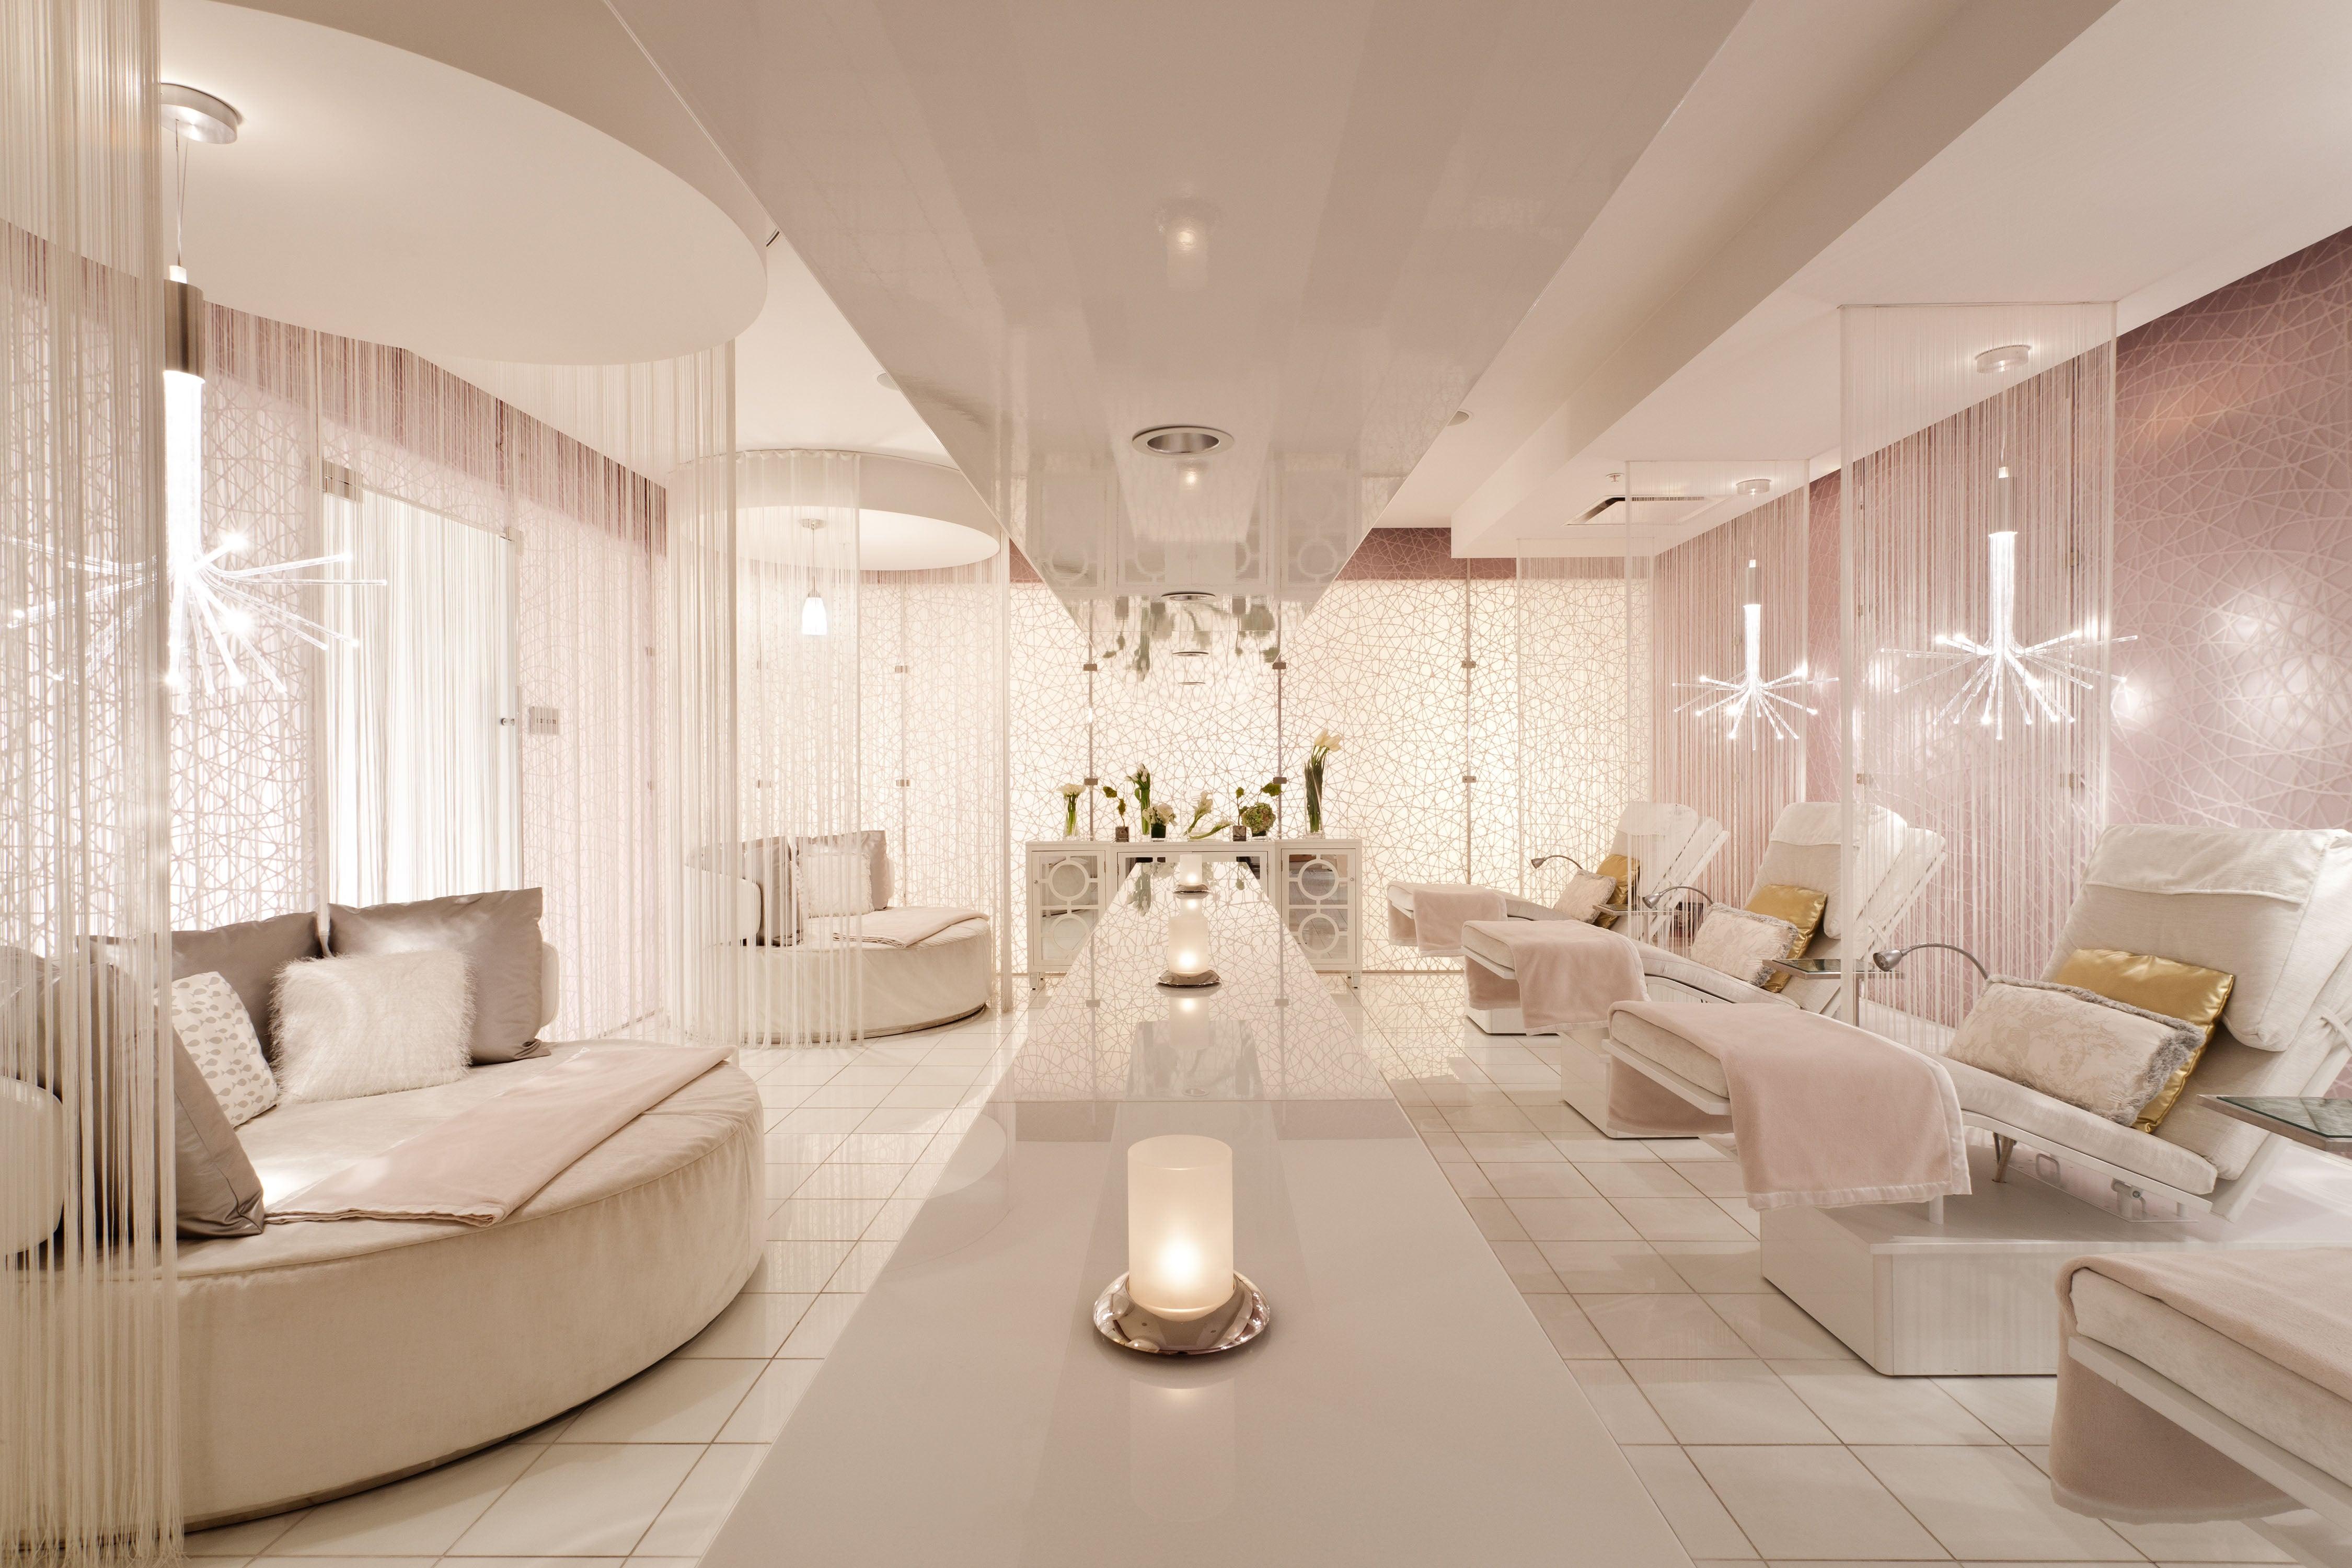 The Ritz-Carlton Spa | L.A. LIVE